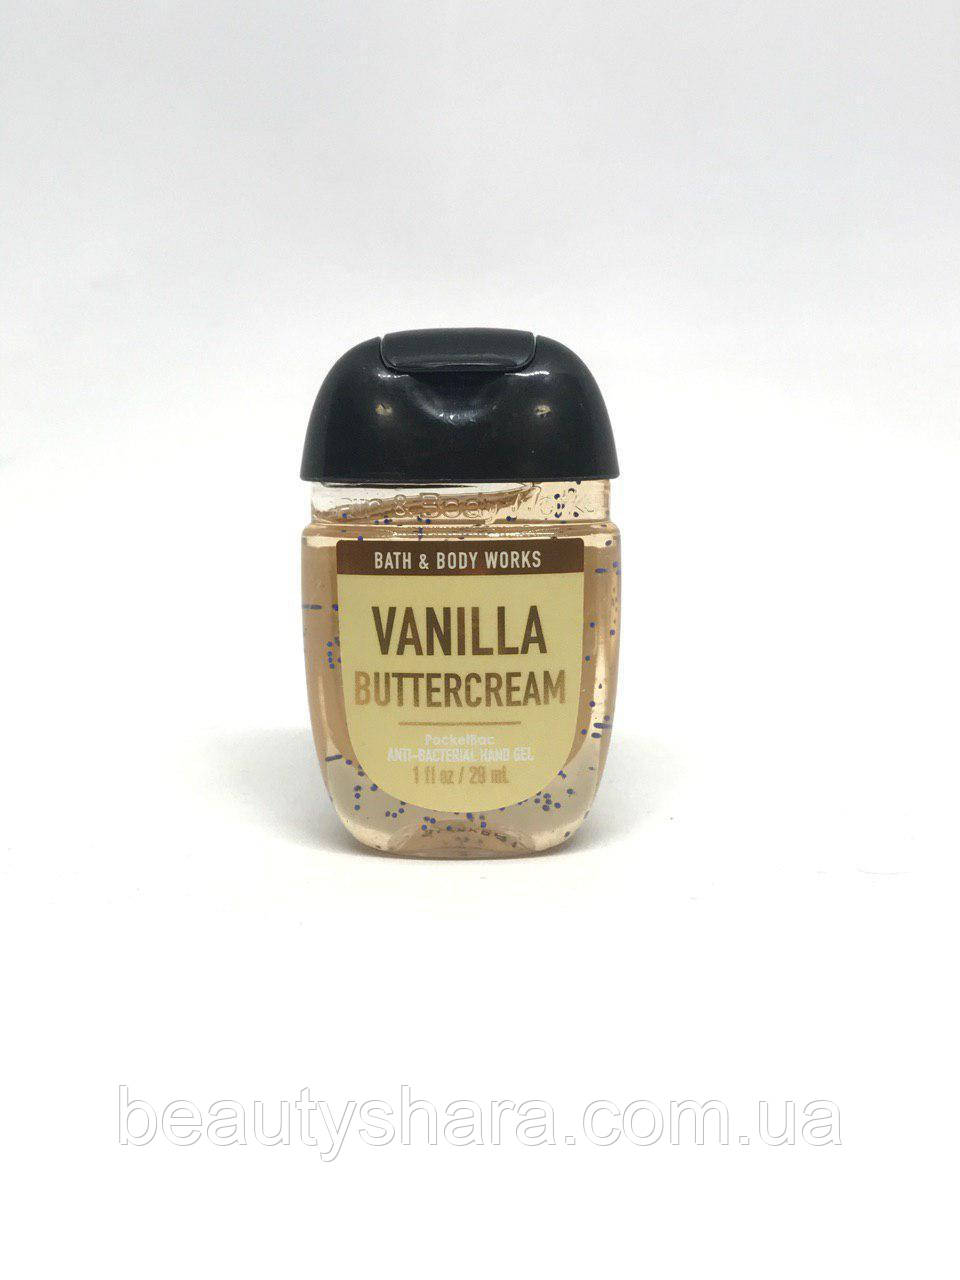 Санитайзер Bath & body works Vanilla Buttercream 29mL